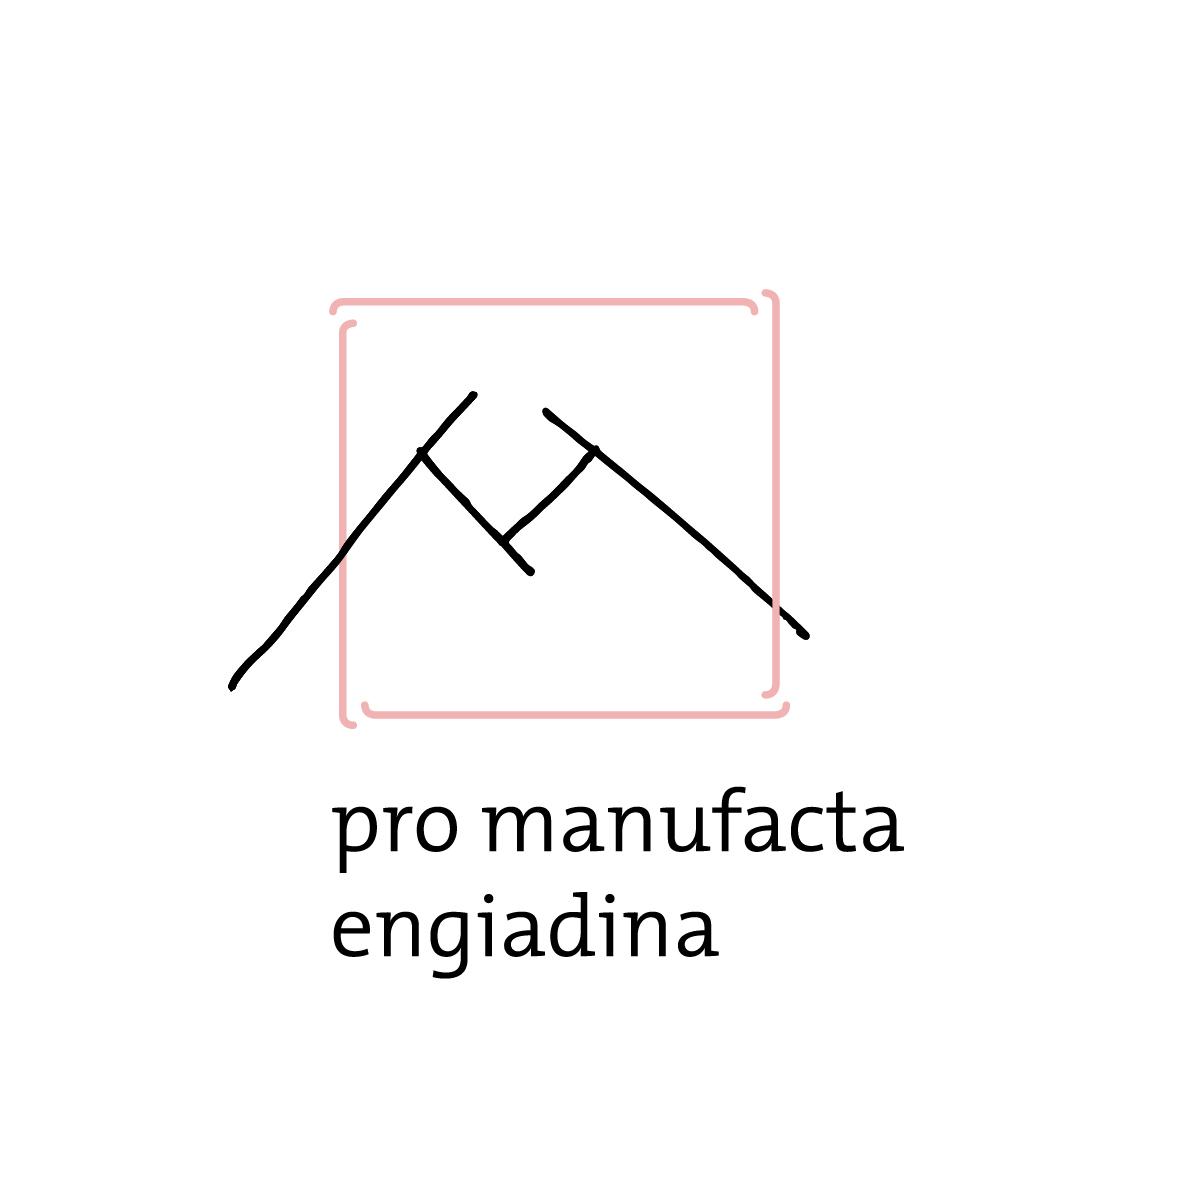 logo pro manufacta engiadina_RZ_100x100